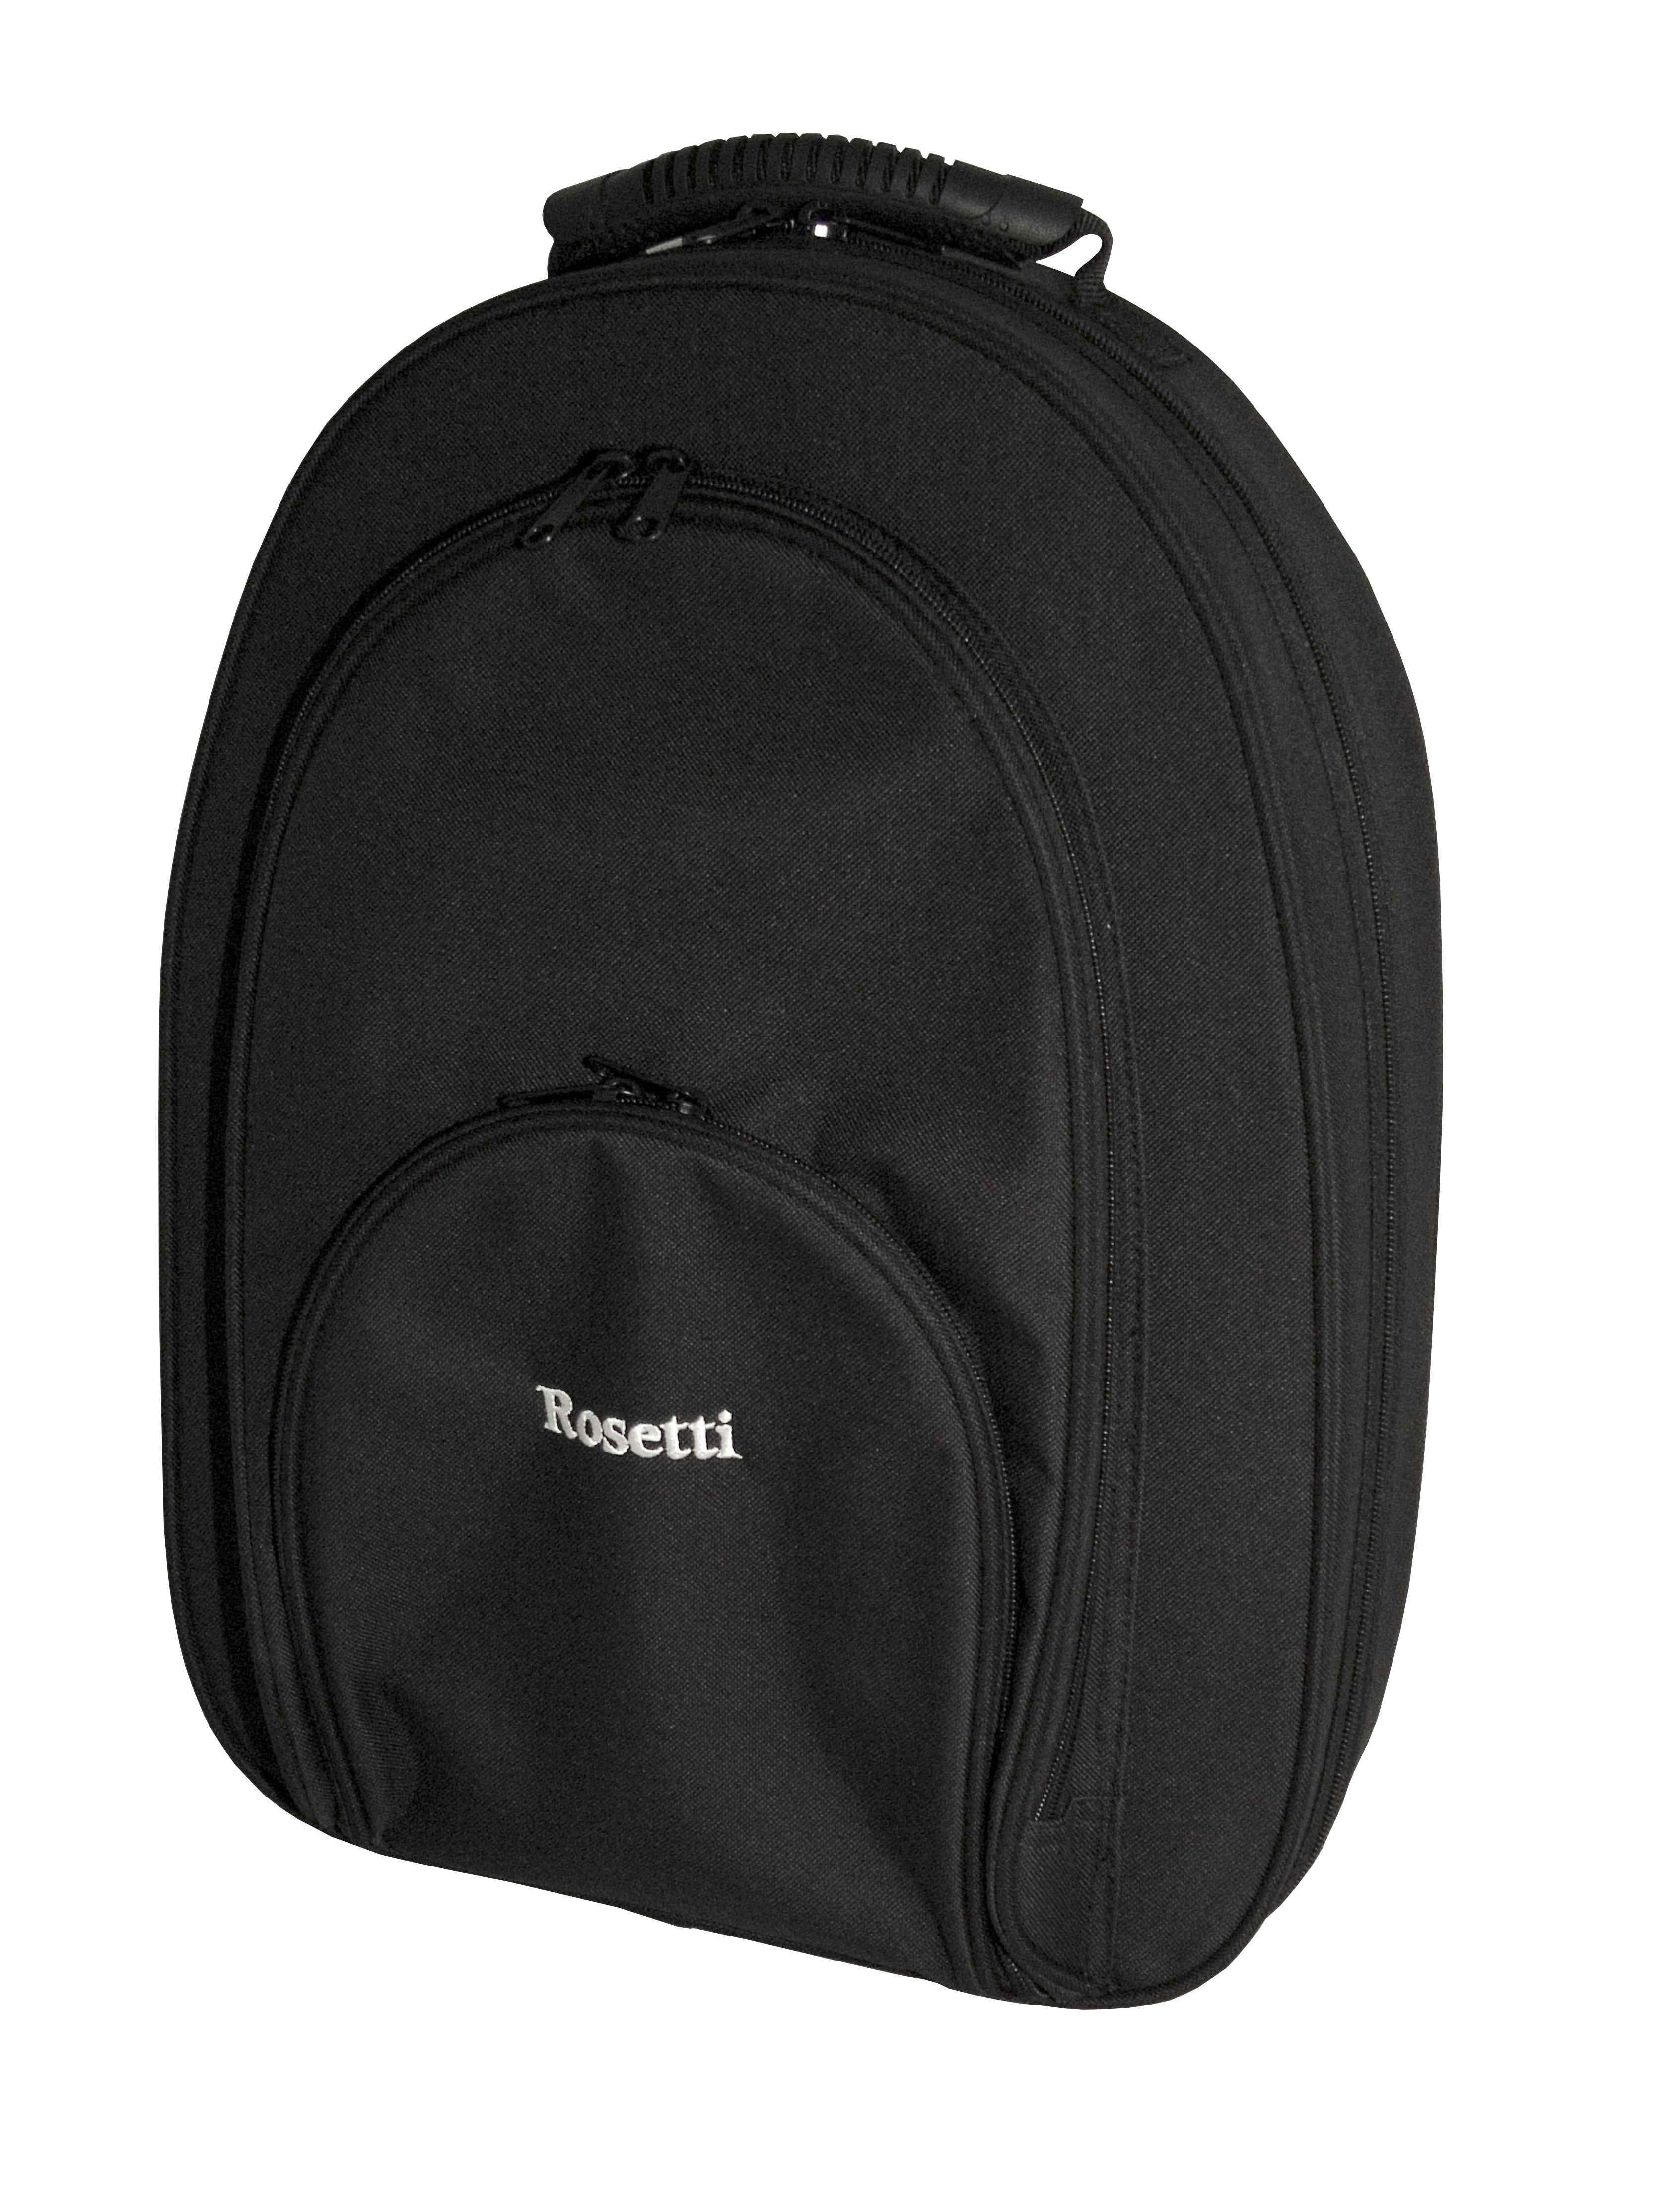 Rosetti Double Clarinet Bag - Black